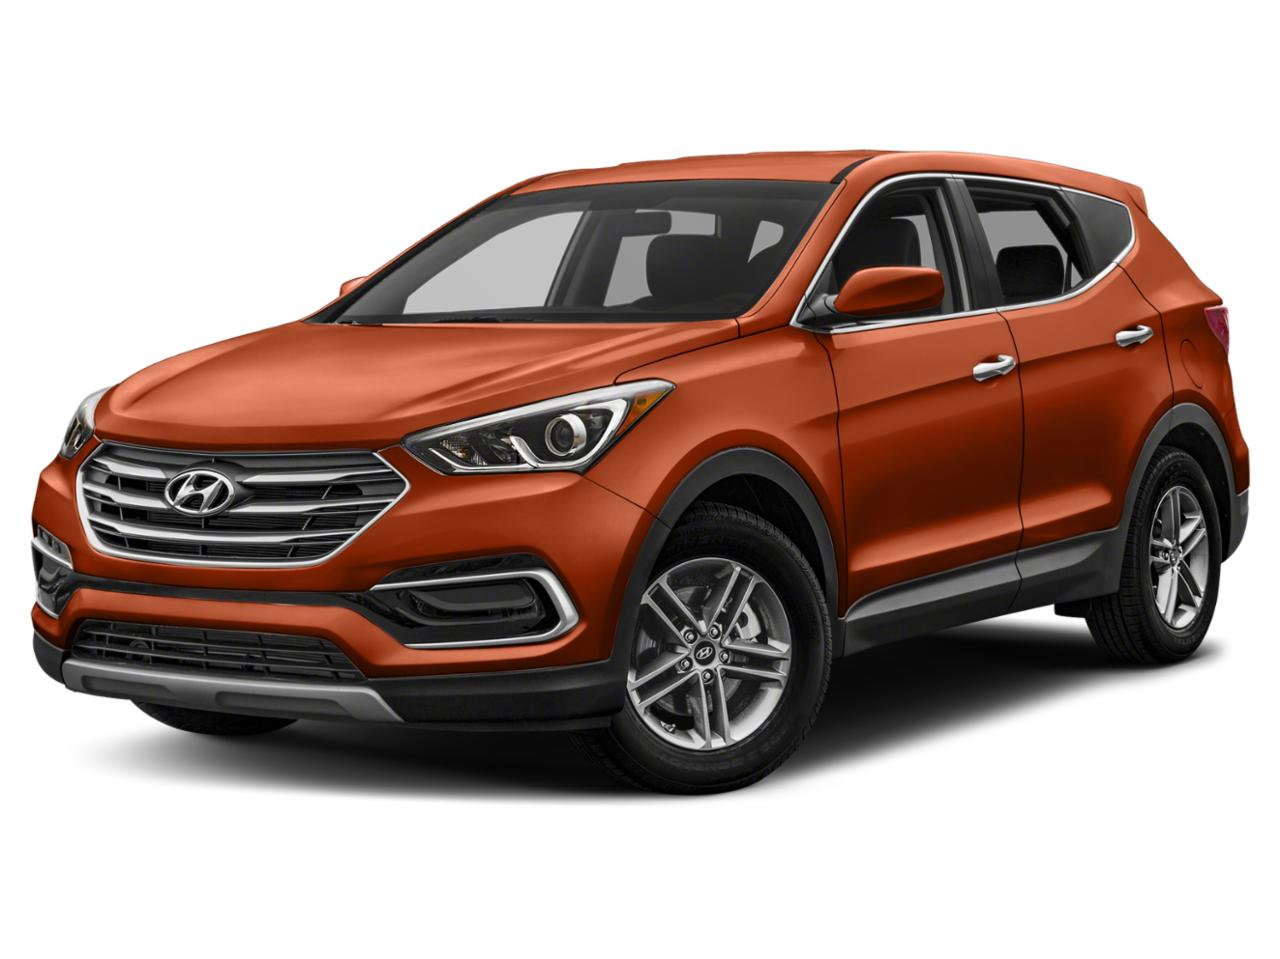 2018 Hyundai Santa Fe Sport Vehicle Photo in Owensboro, KY 42303